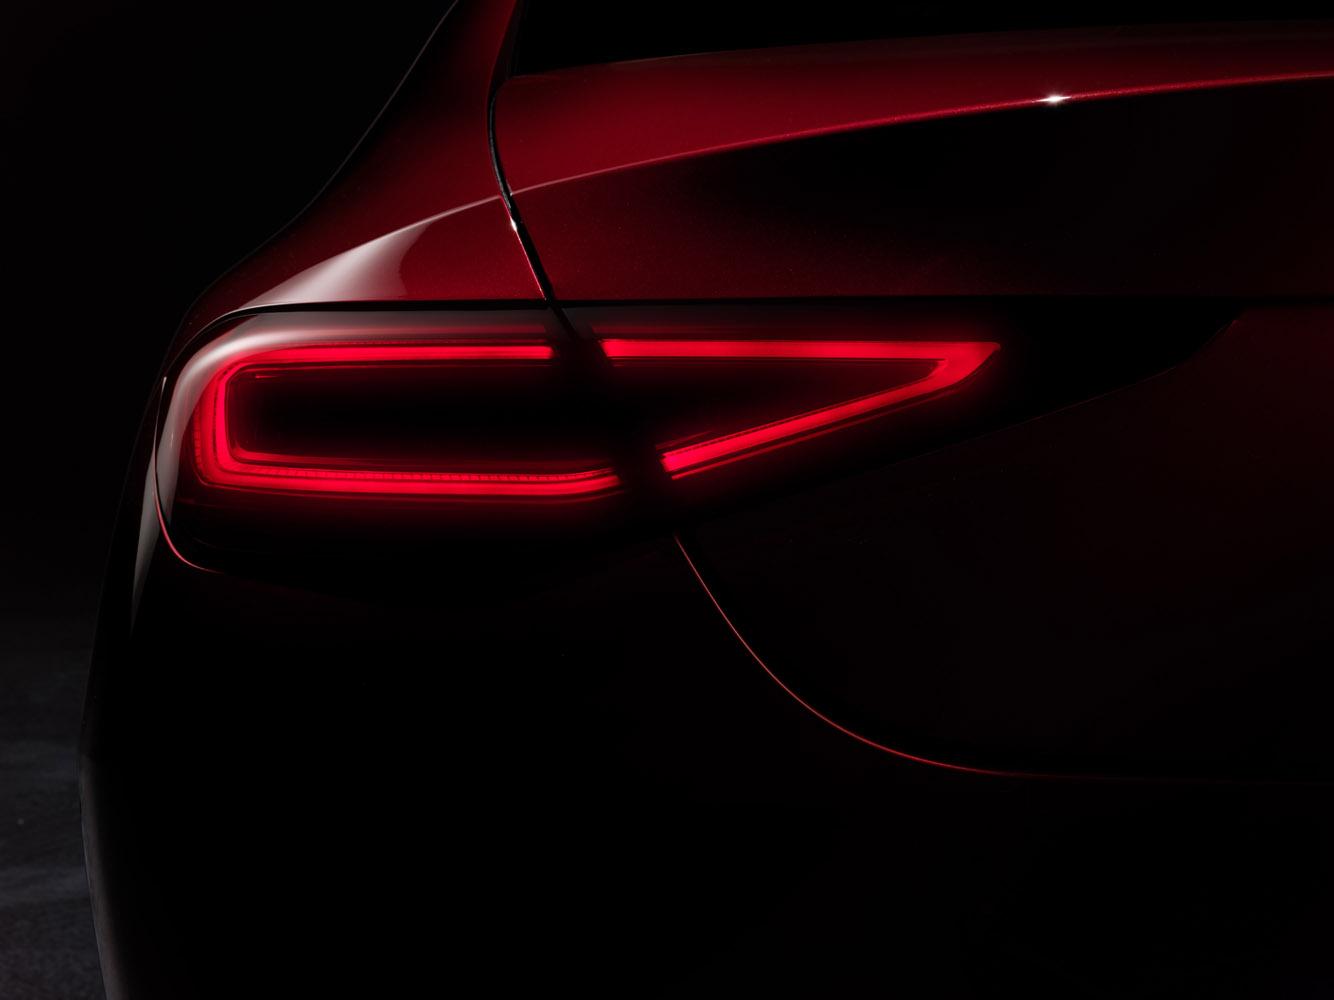 Mercedes-Benz CLS, 2017, hyacintröd metallic